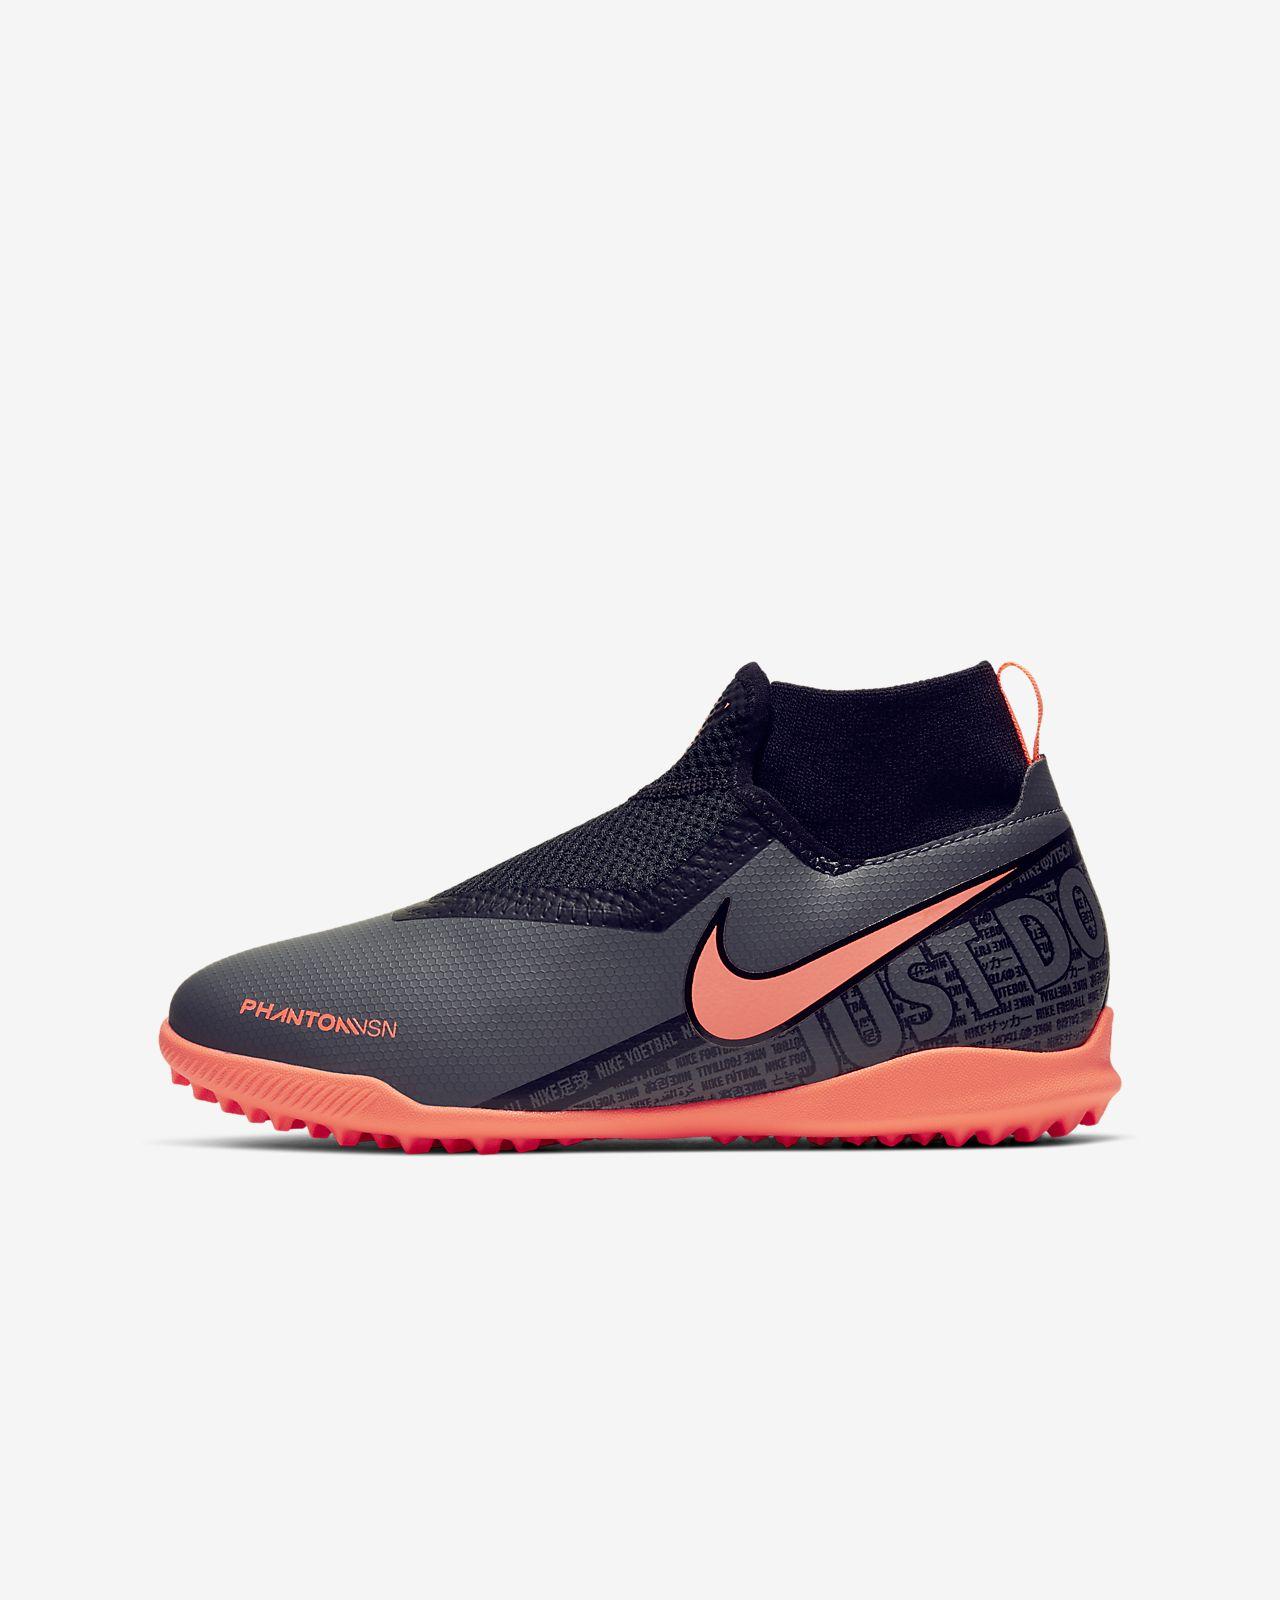 Nike Jr. Phantom Vision Academy Dynamic Fit Botas de fútbol para moqueta - Turf - Niño/a y niño/a pequeño/a